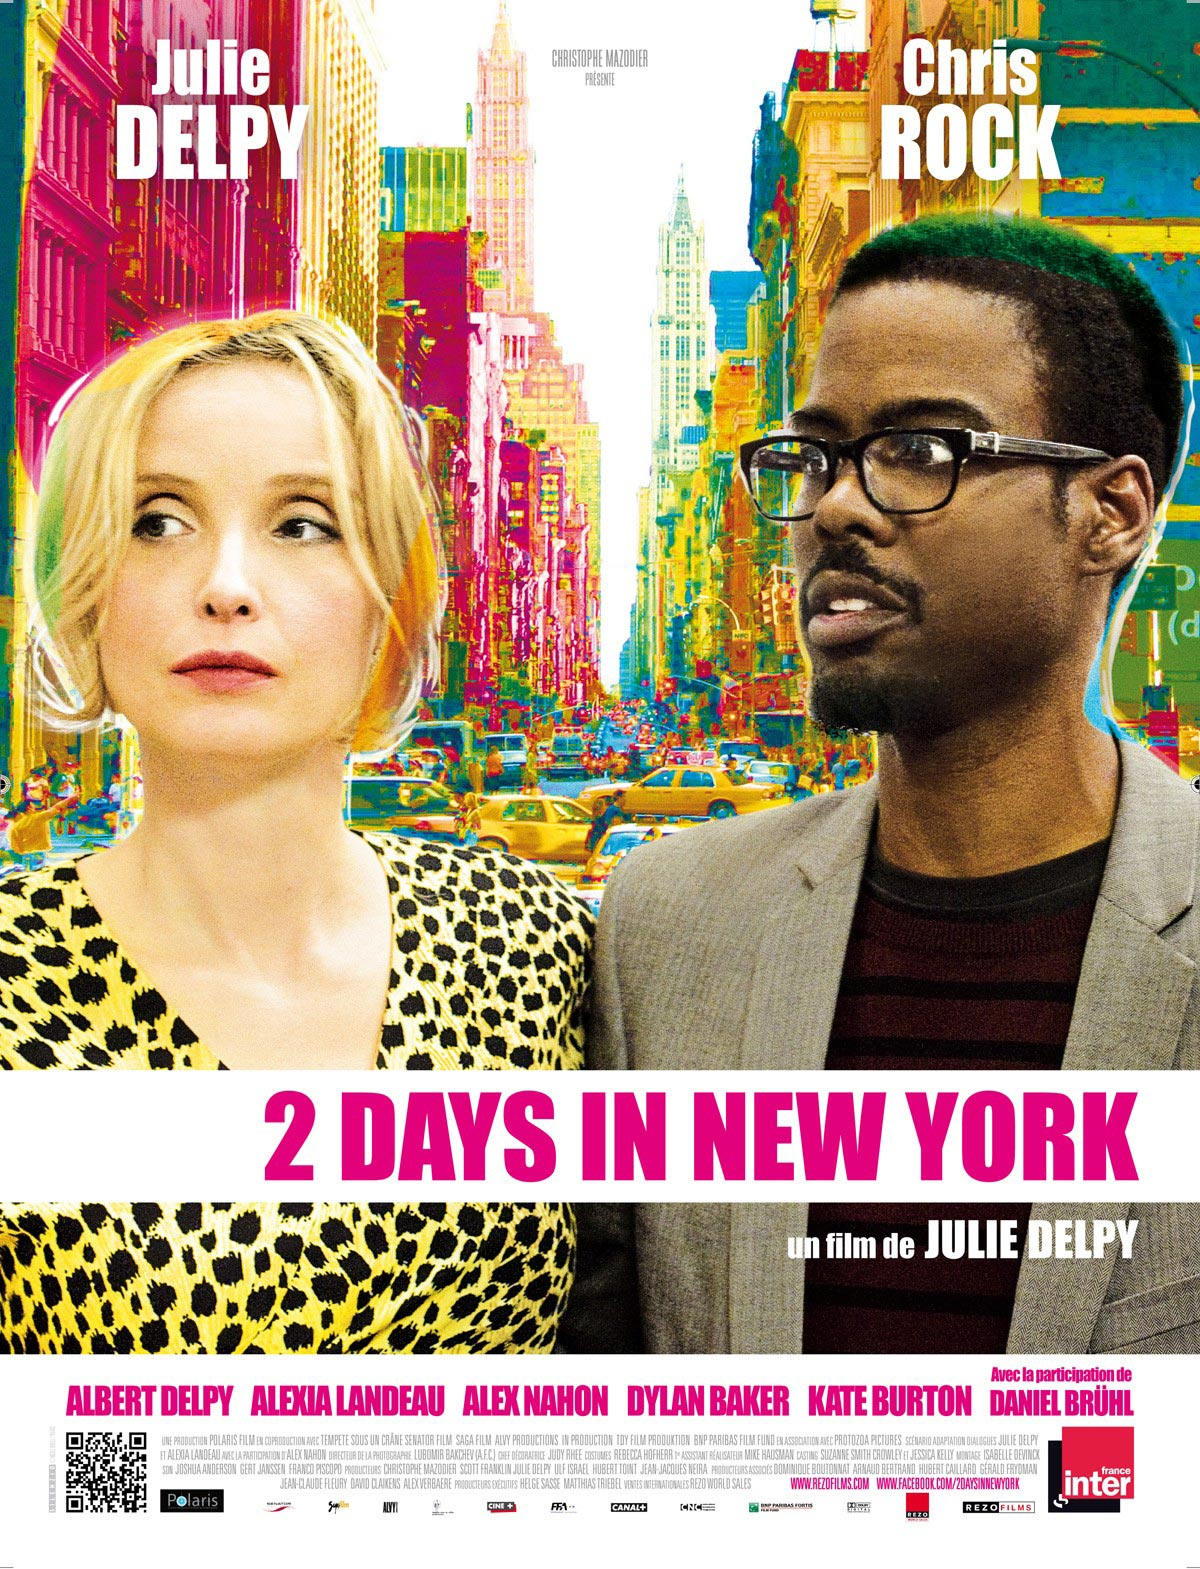 Days in new york de julie delpy